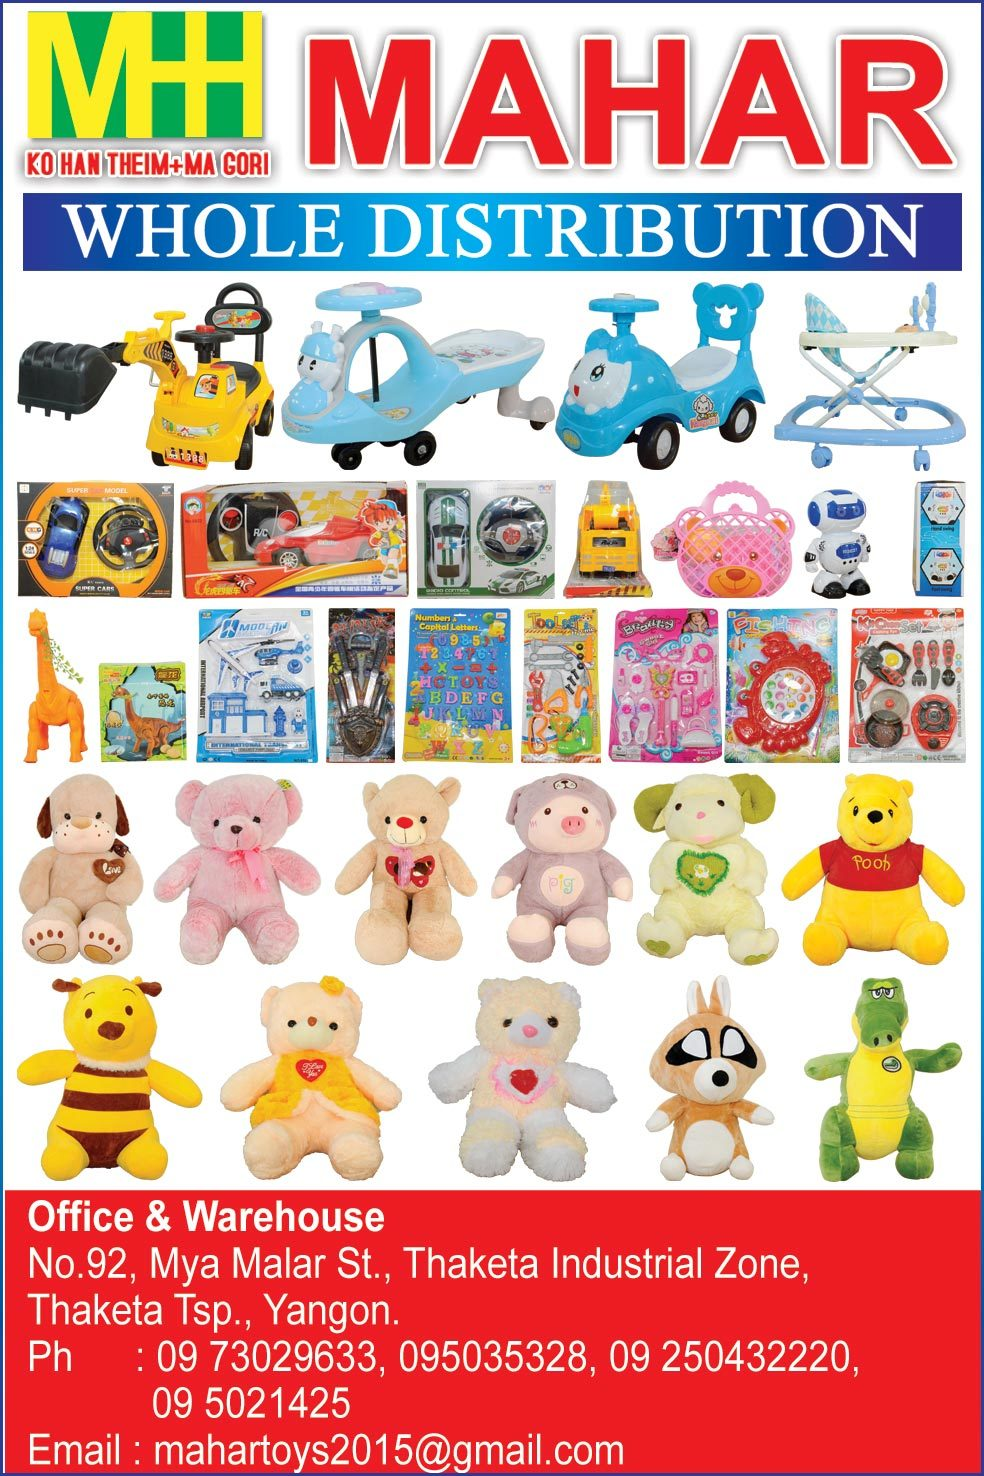 Mahar-Toys-Universe_Toy-Shops_(B)_4442.jpg